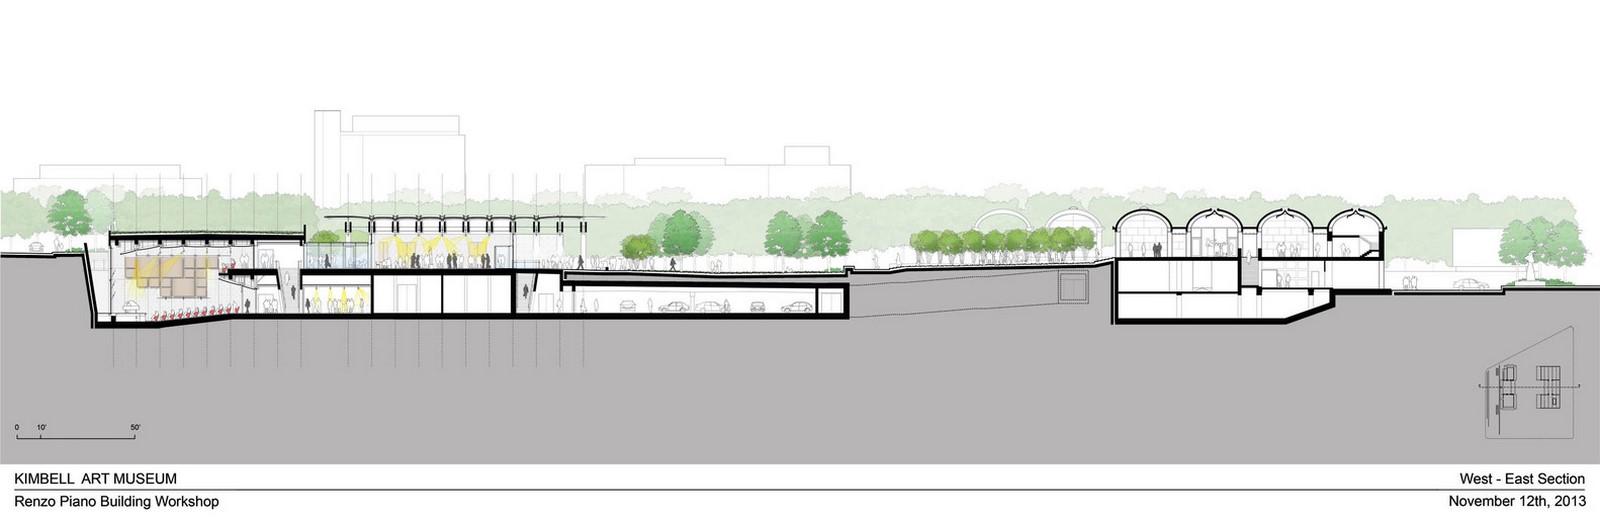 Kimbell Art Museum by Renzo Piano: Mecca of modern architecture - Sheet4